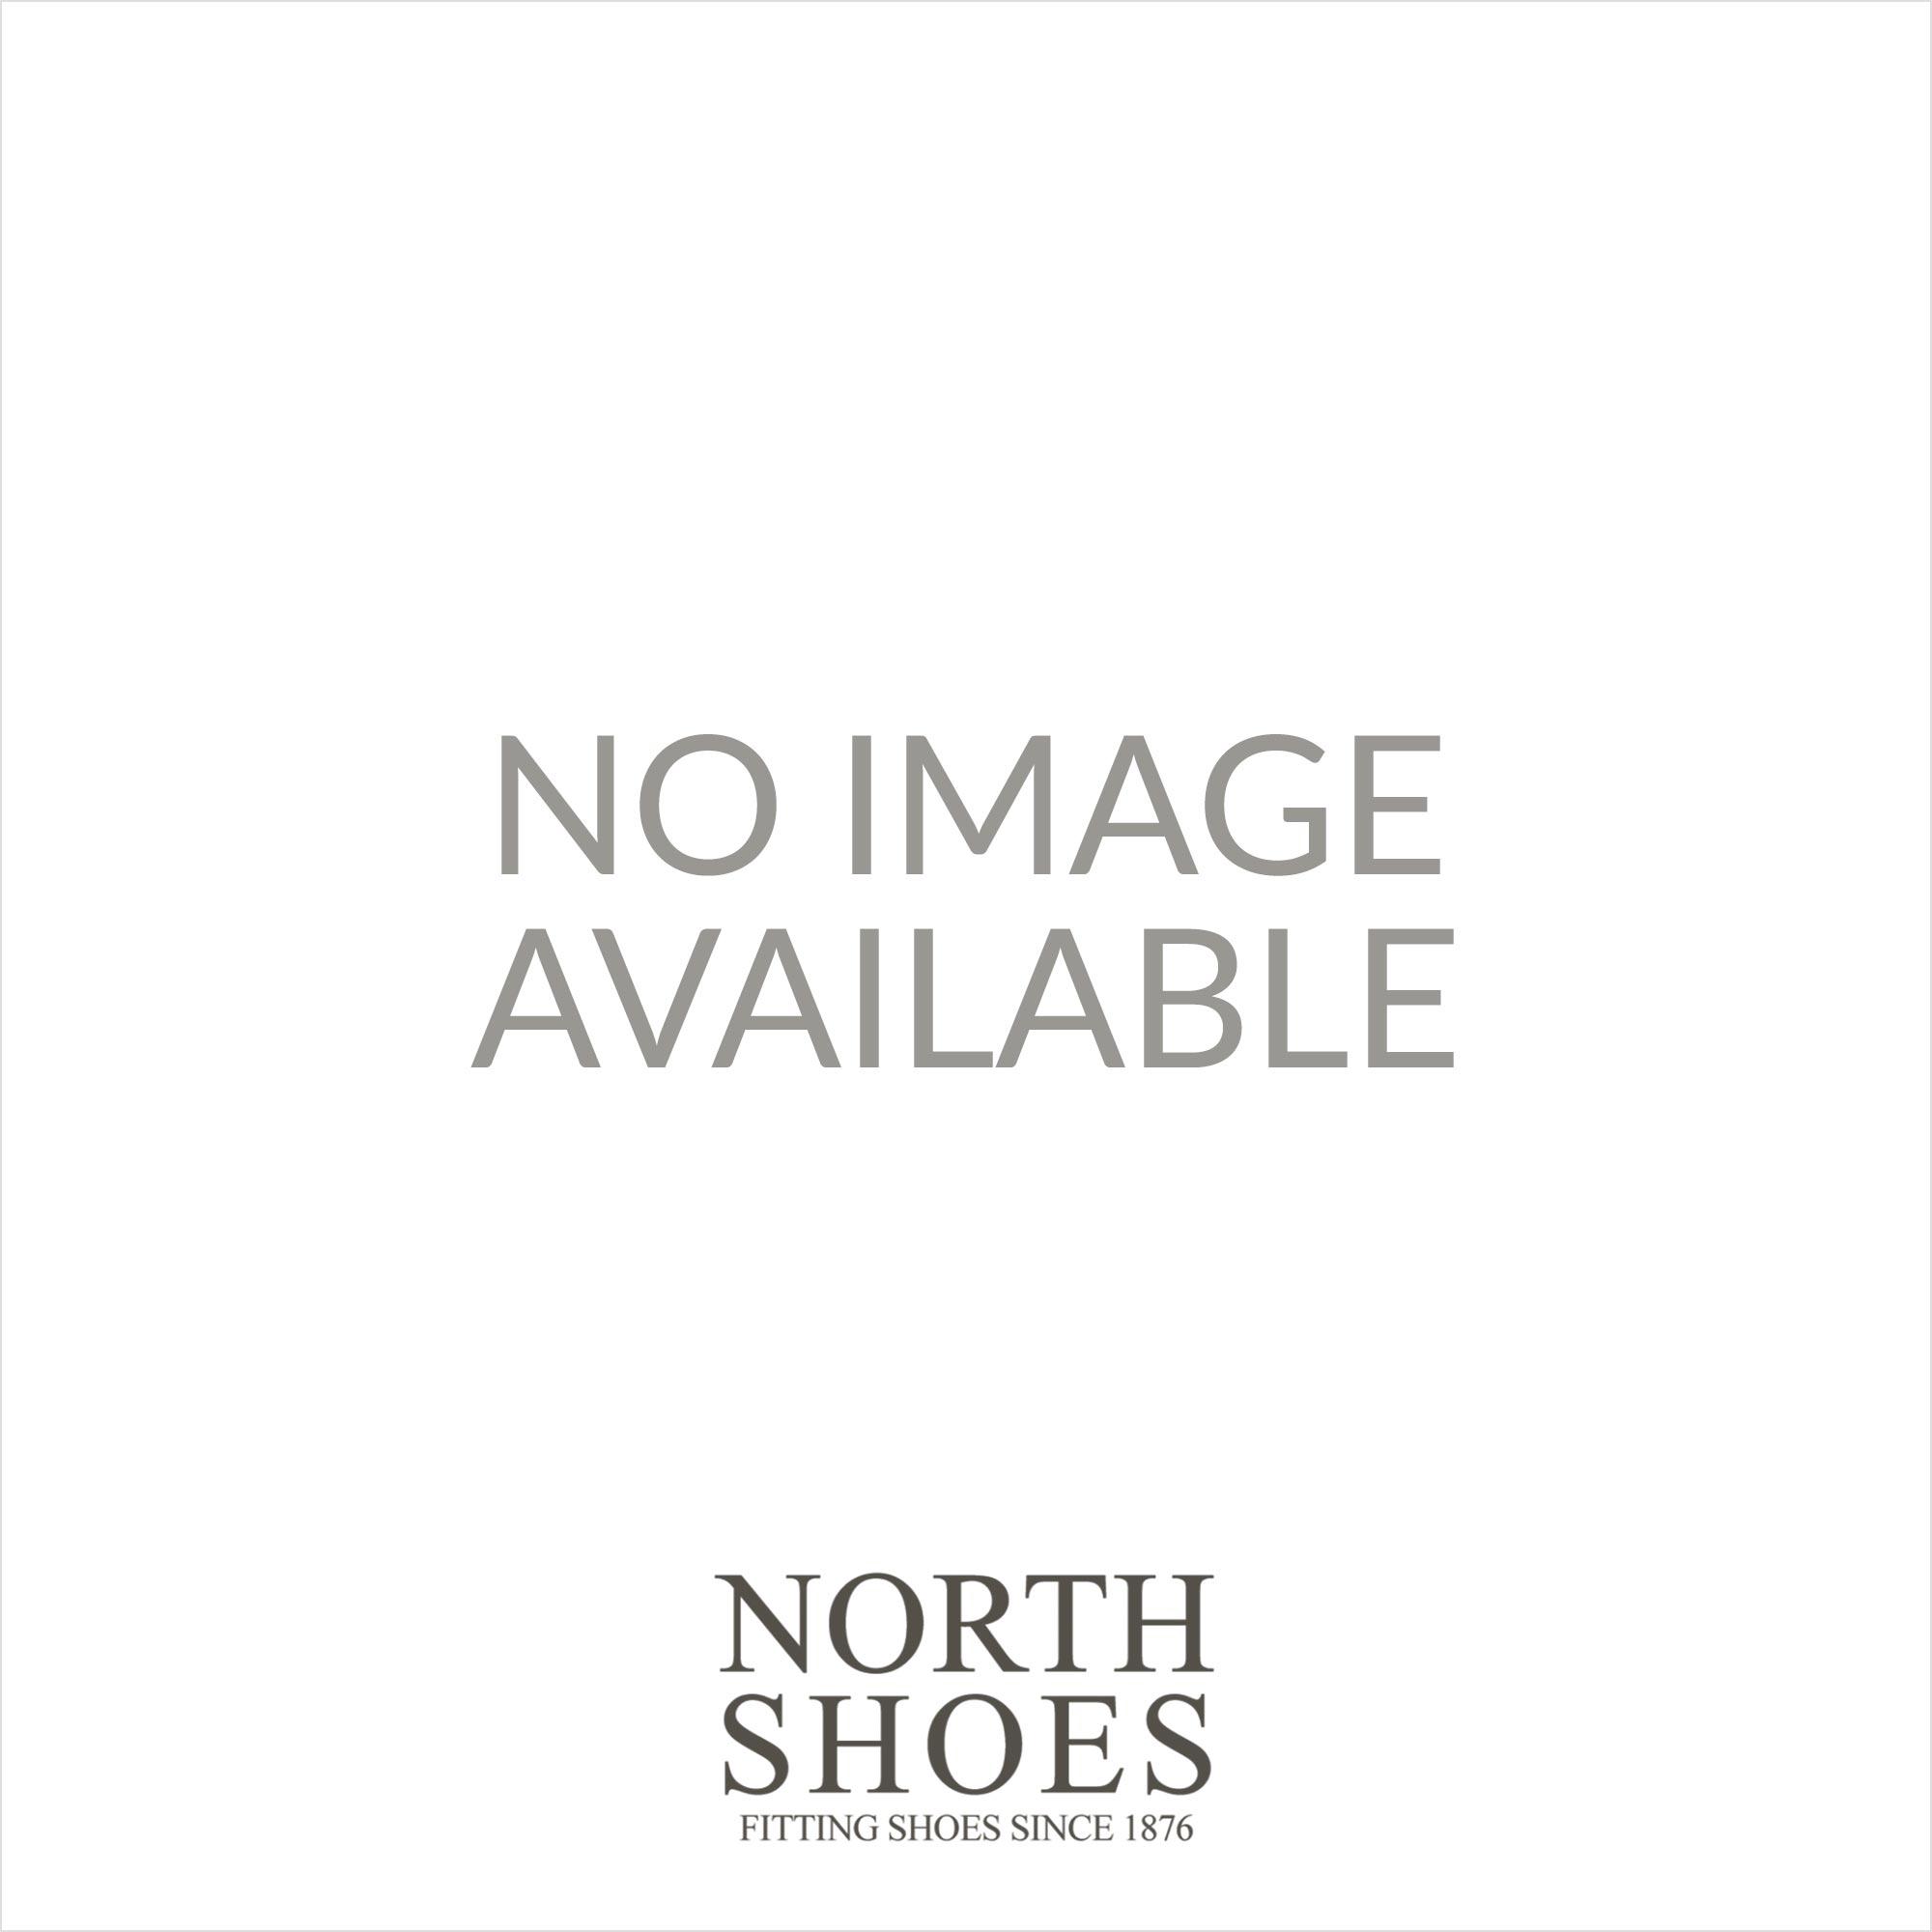 B272 Beige And White Leather Womens Heeled Slingback Sandal